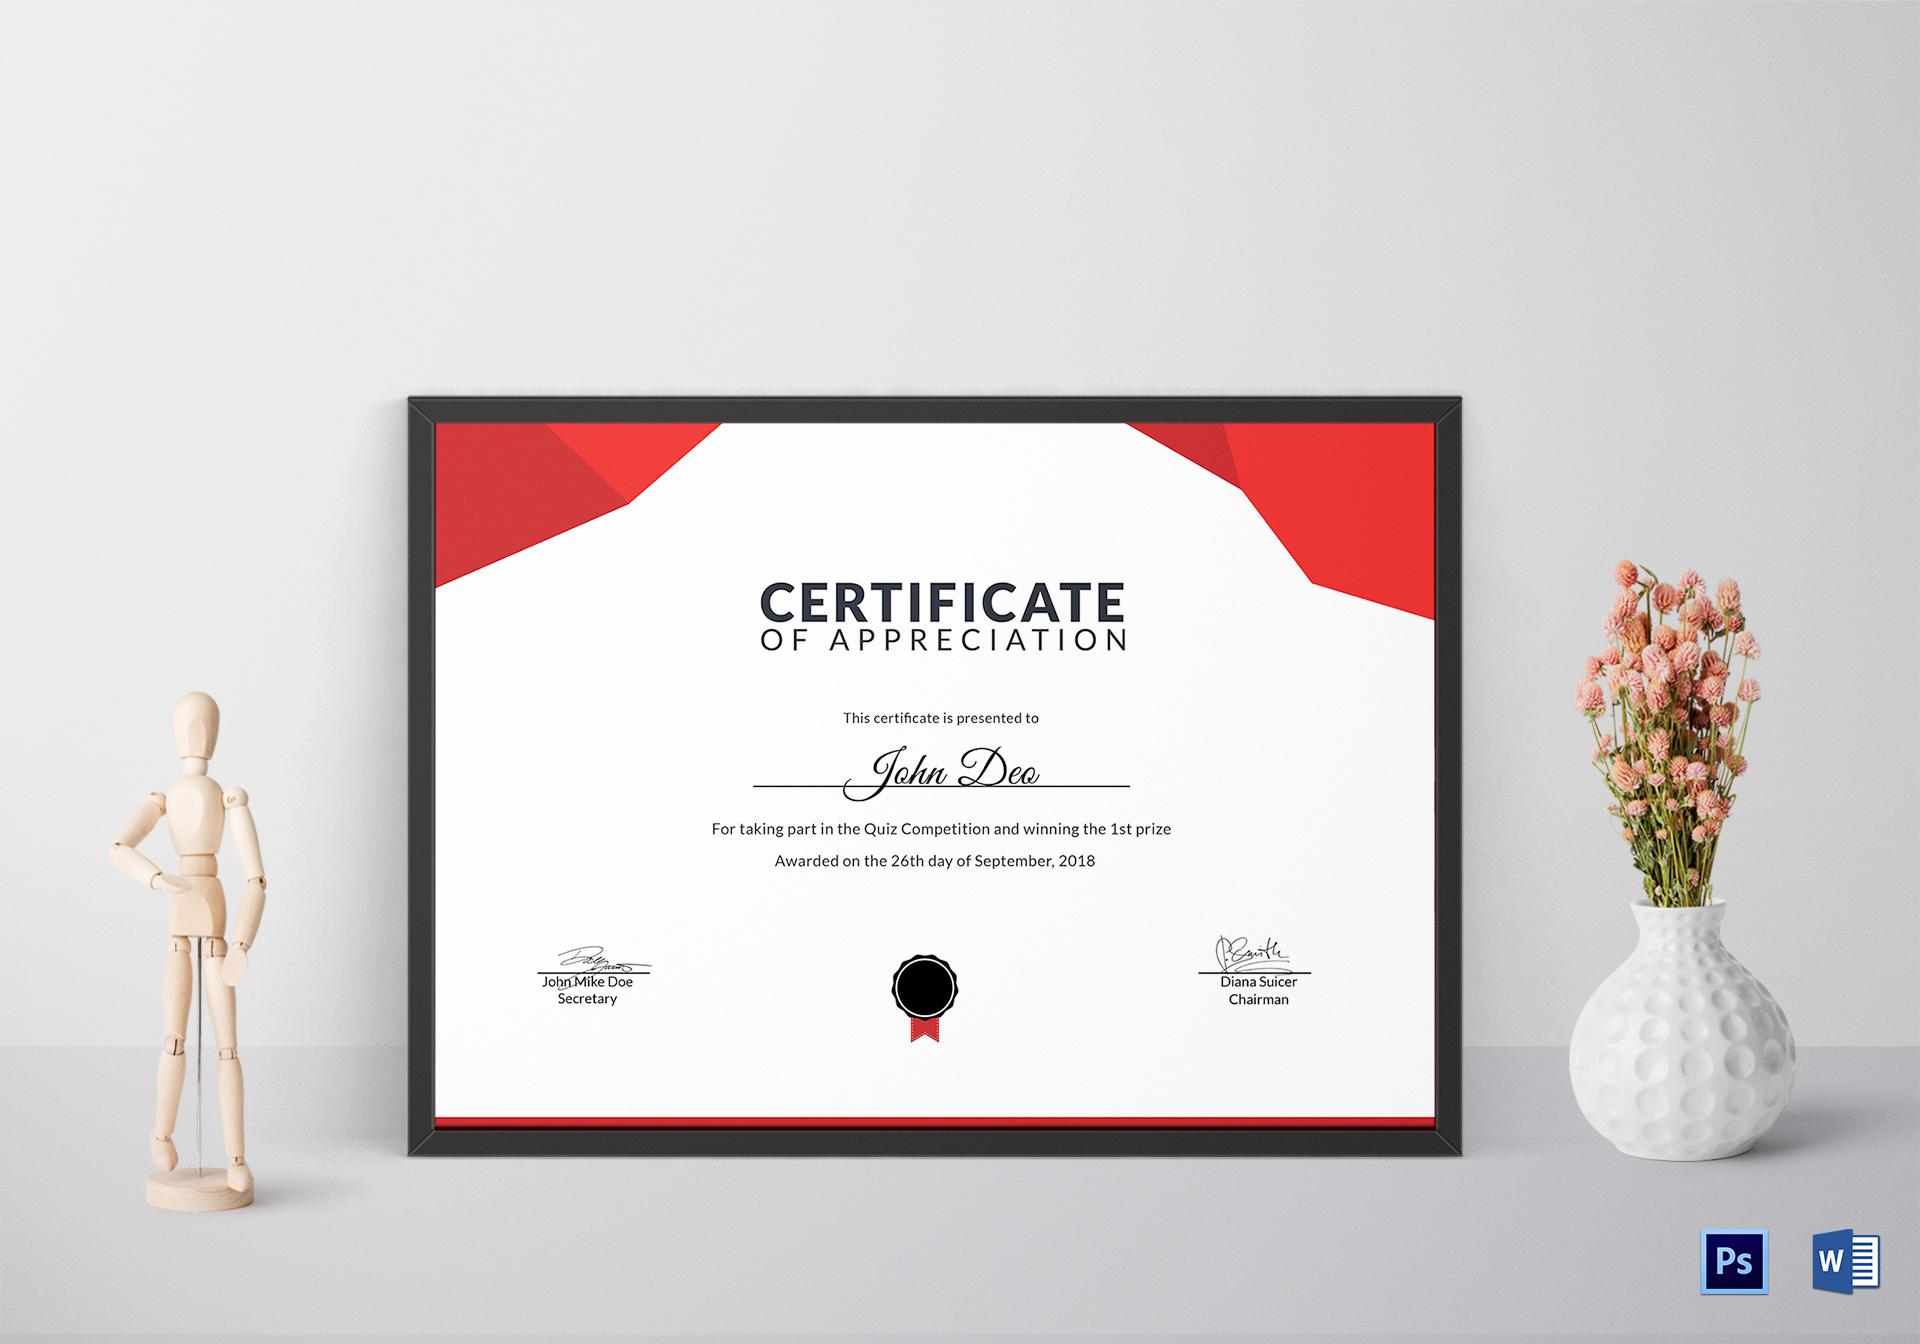 Prize Appreciation Certificate Template